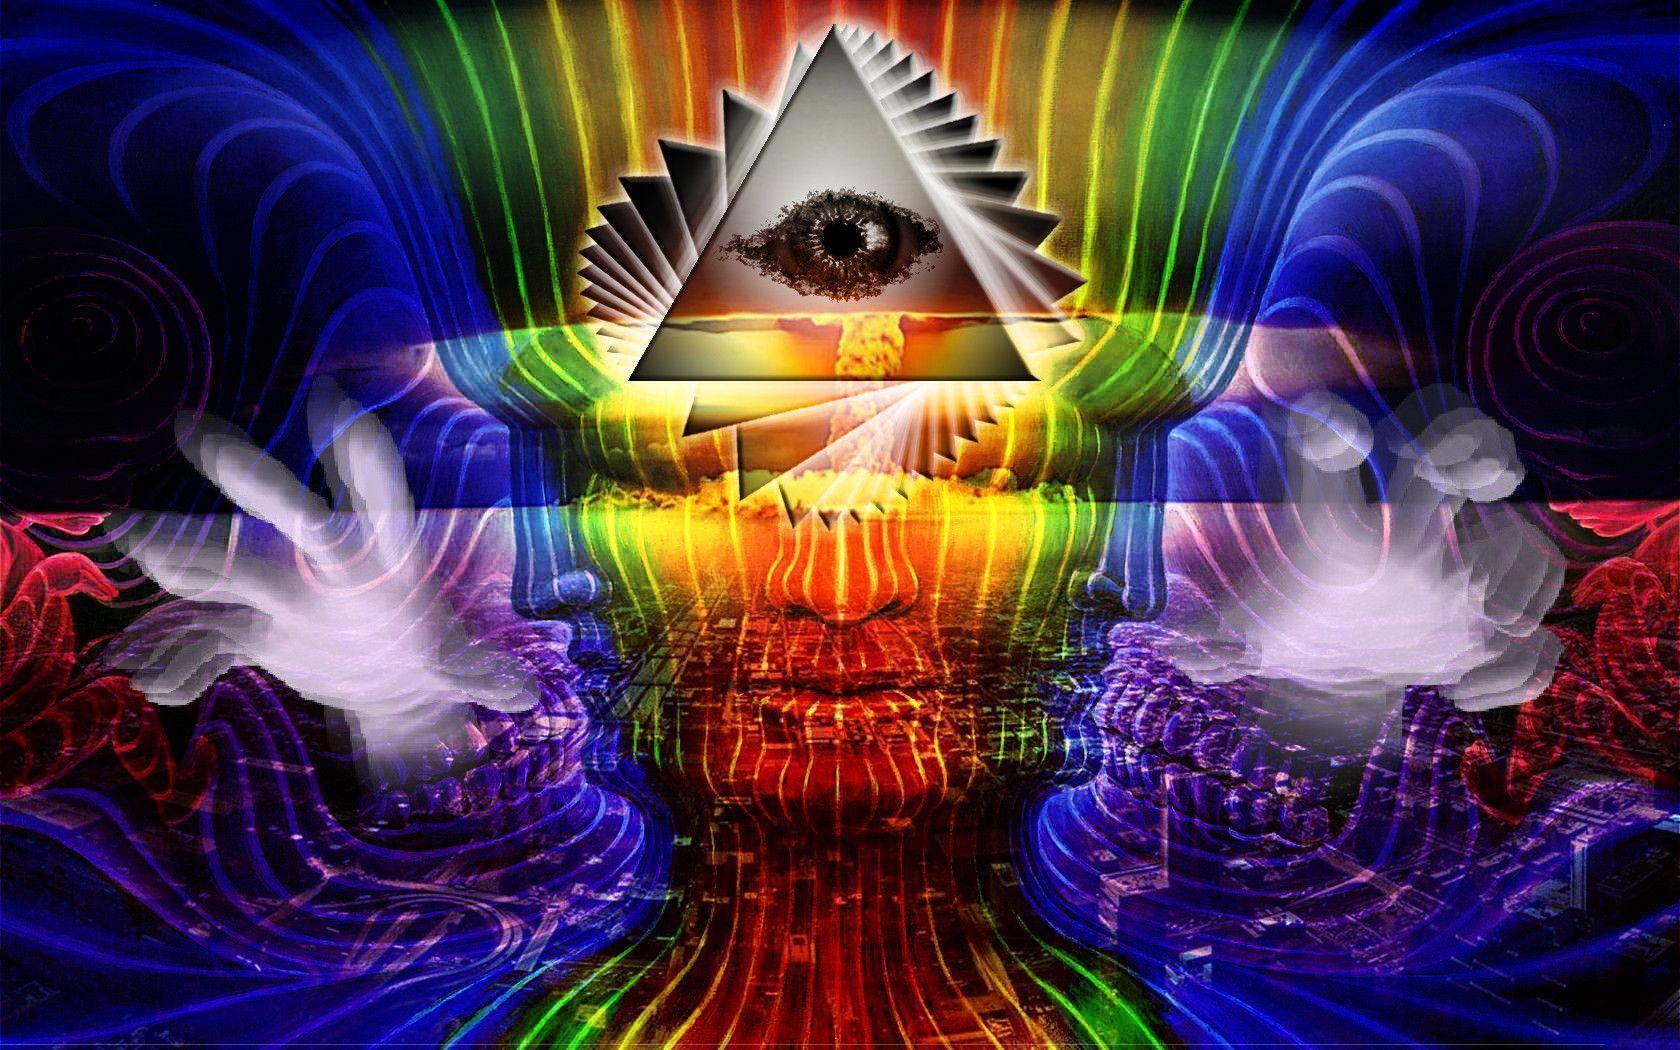 Wallpapers For Illuminati Wallpaper